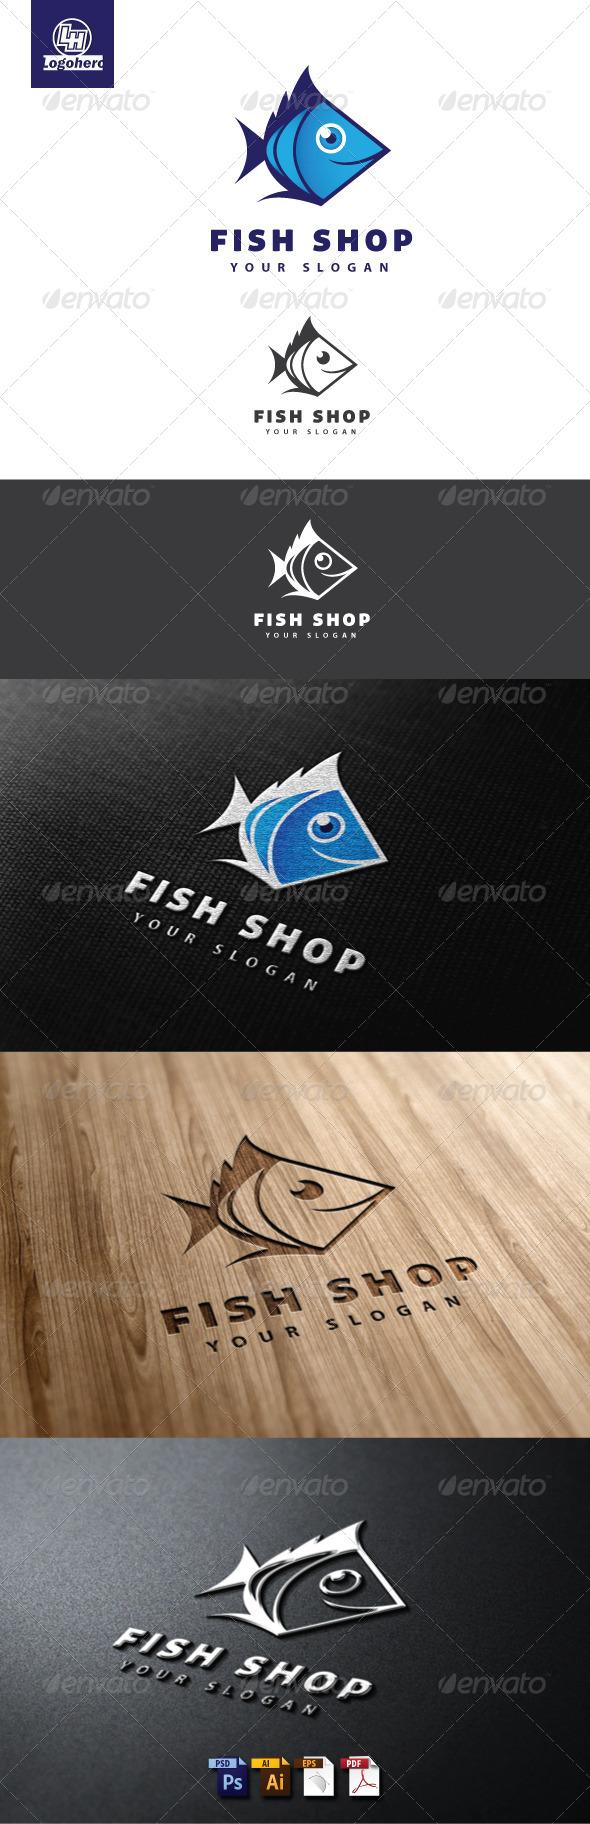 Fish Shop Logo Template - Animals Logo Templates